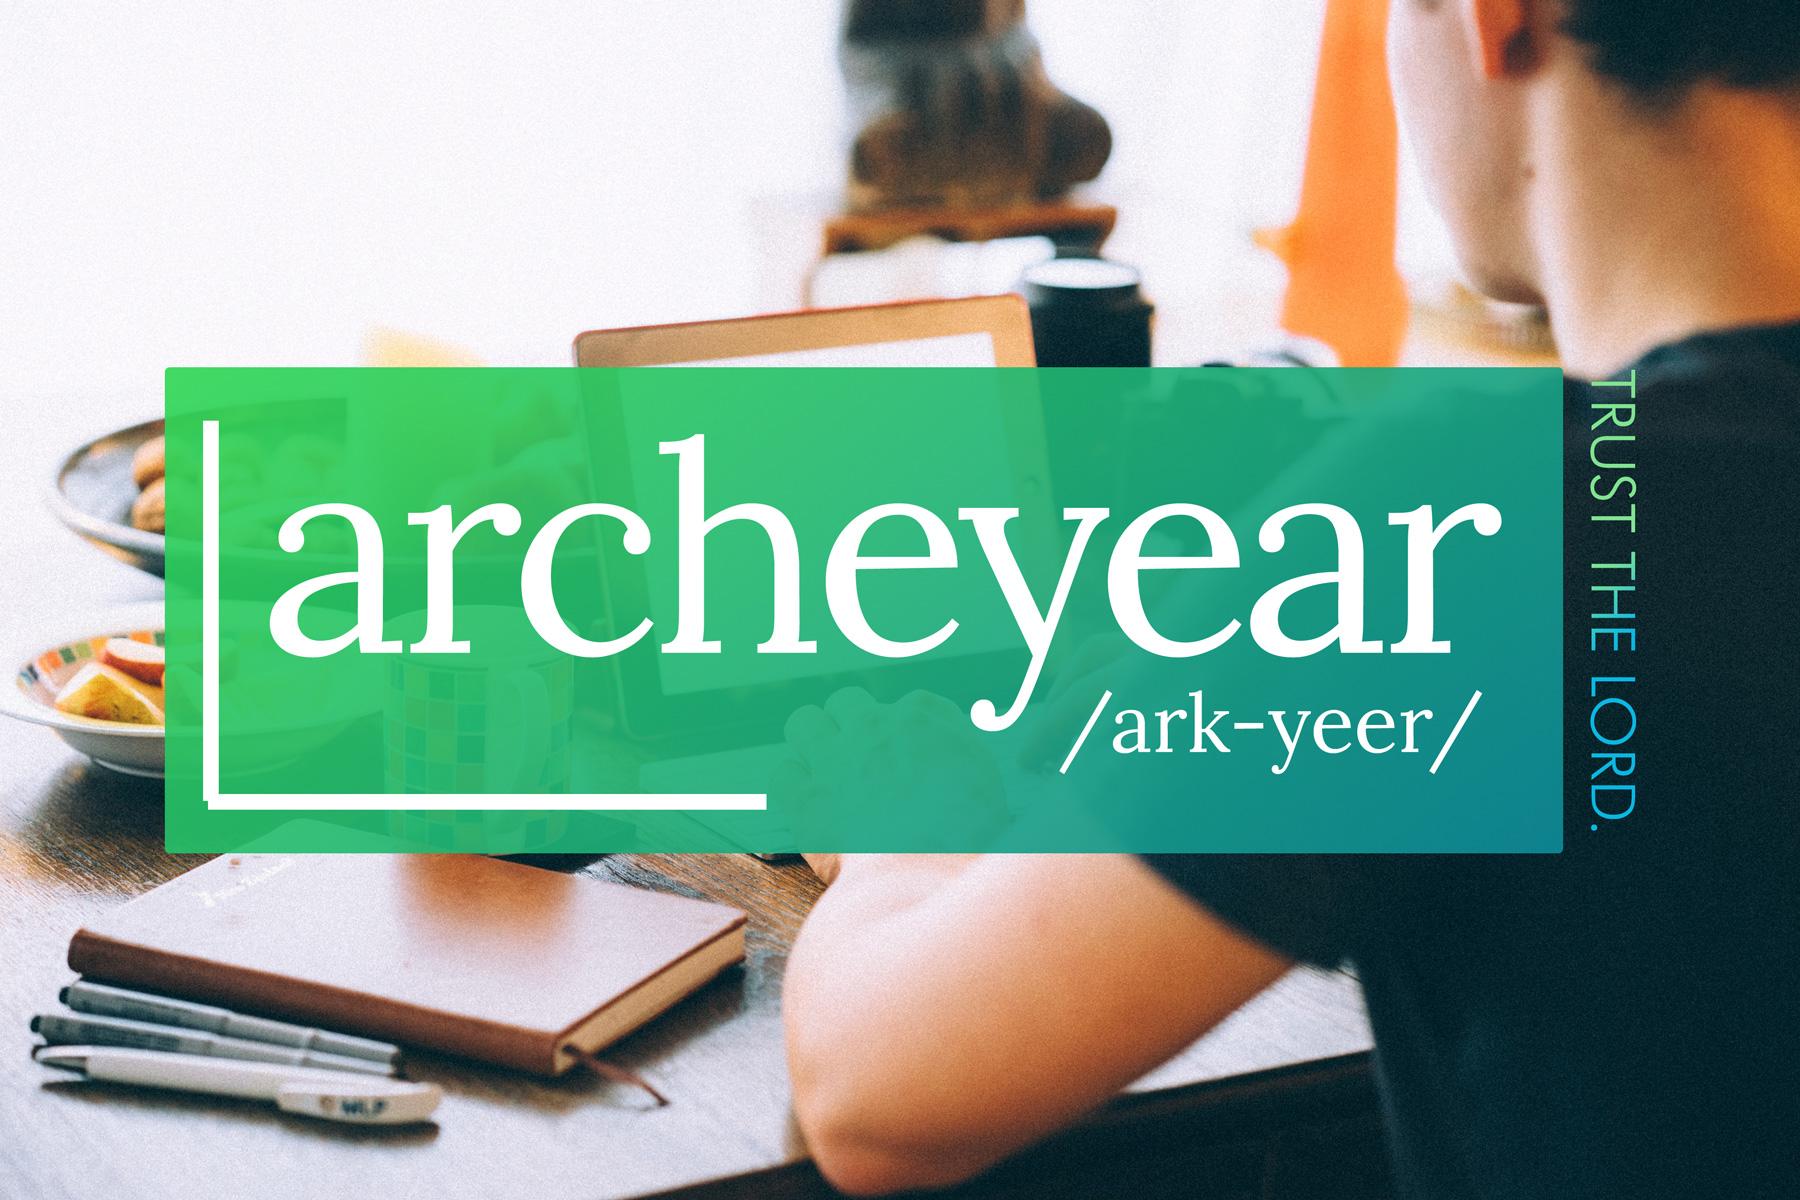 Arche Year Christian Novelist Training